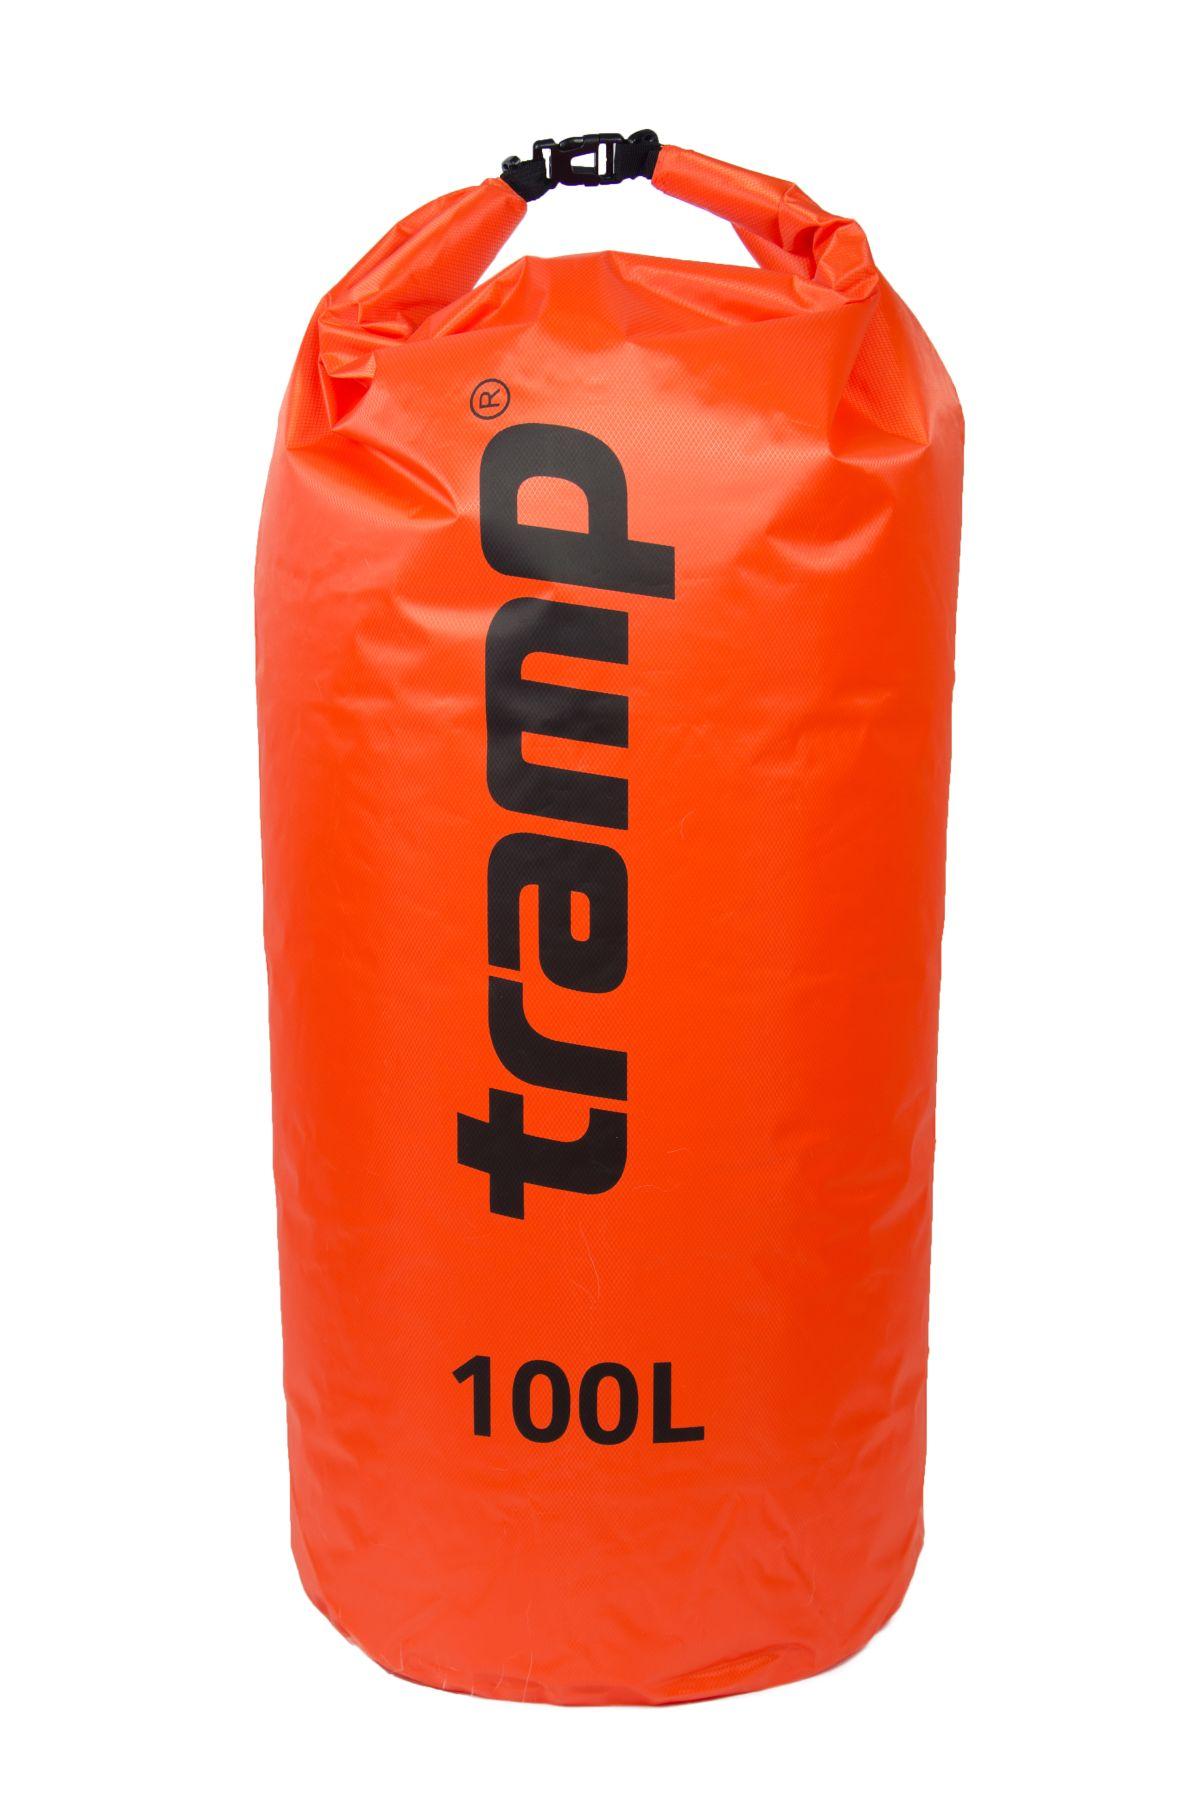 Гермомешок Tramp PVC Diamond Rip-Stop TRA-210-orange 100л оранжевый